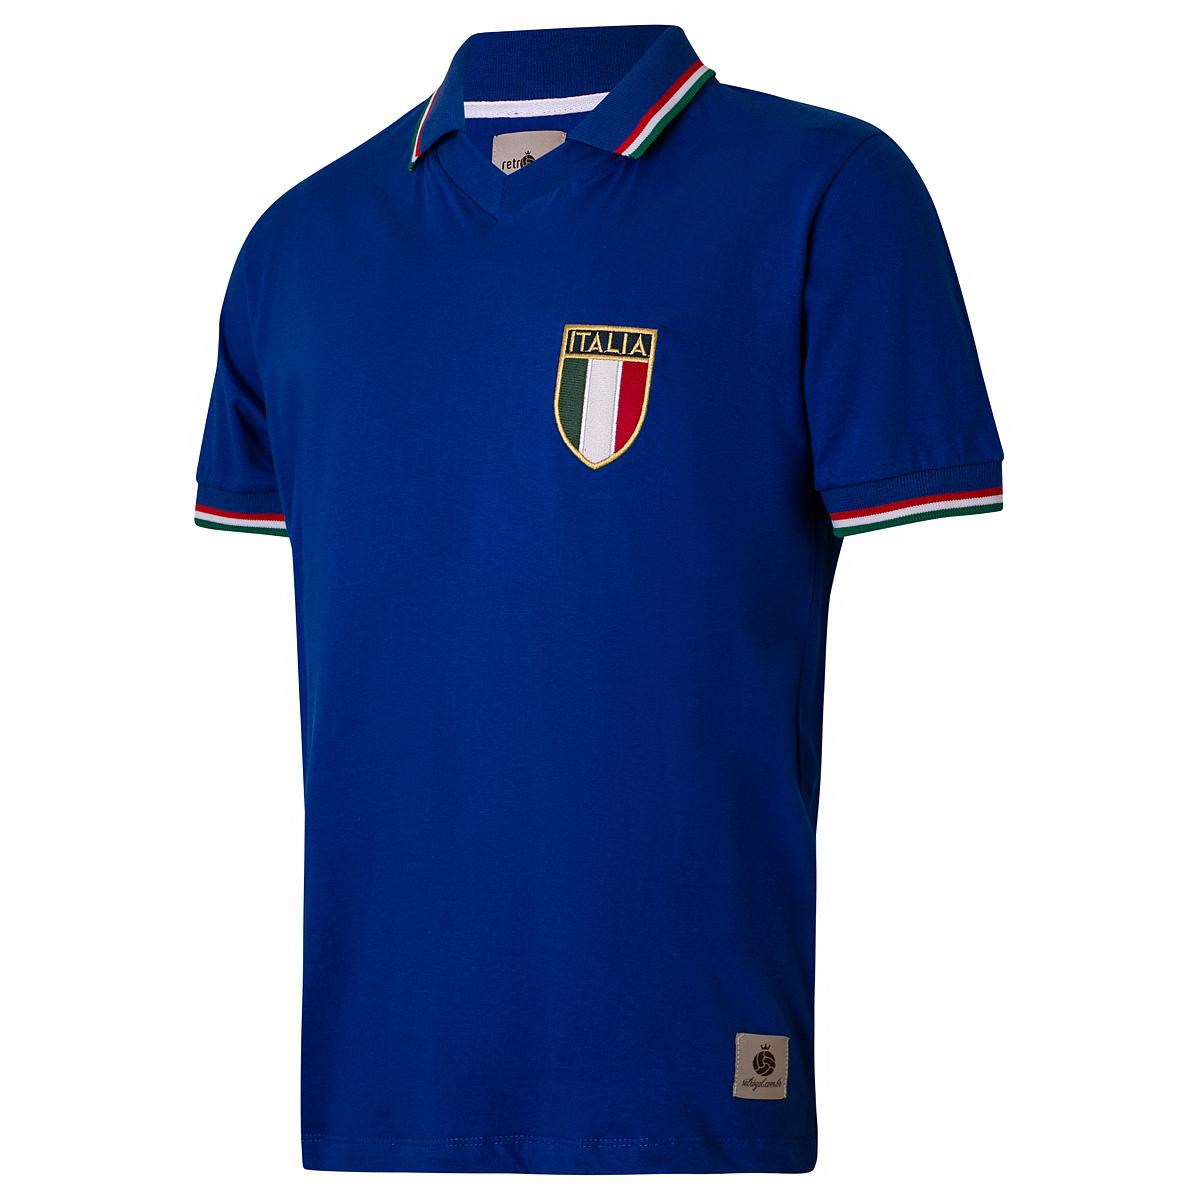 Camisa Itália Retrô 1982 Masculina